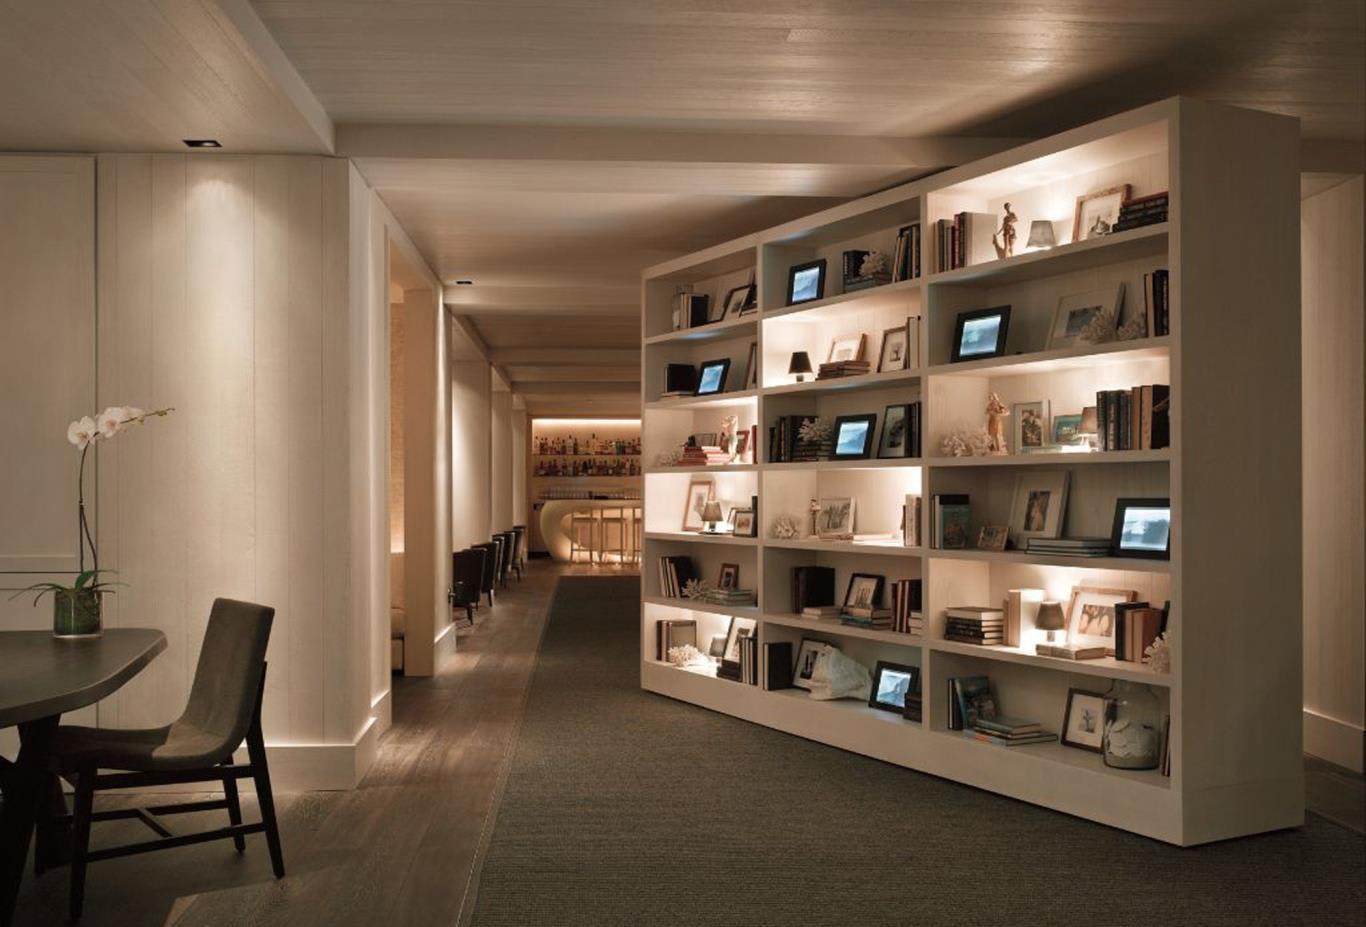 The Study Lounge